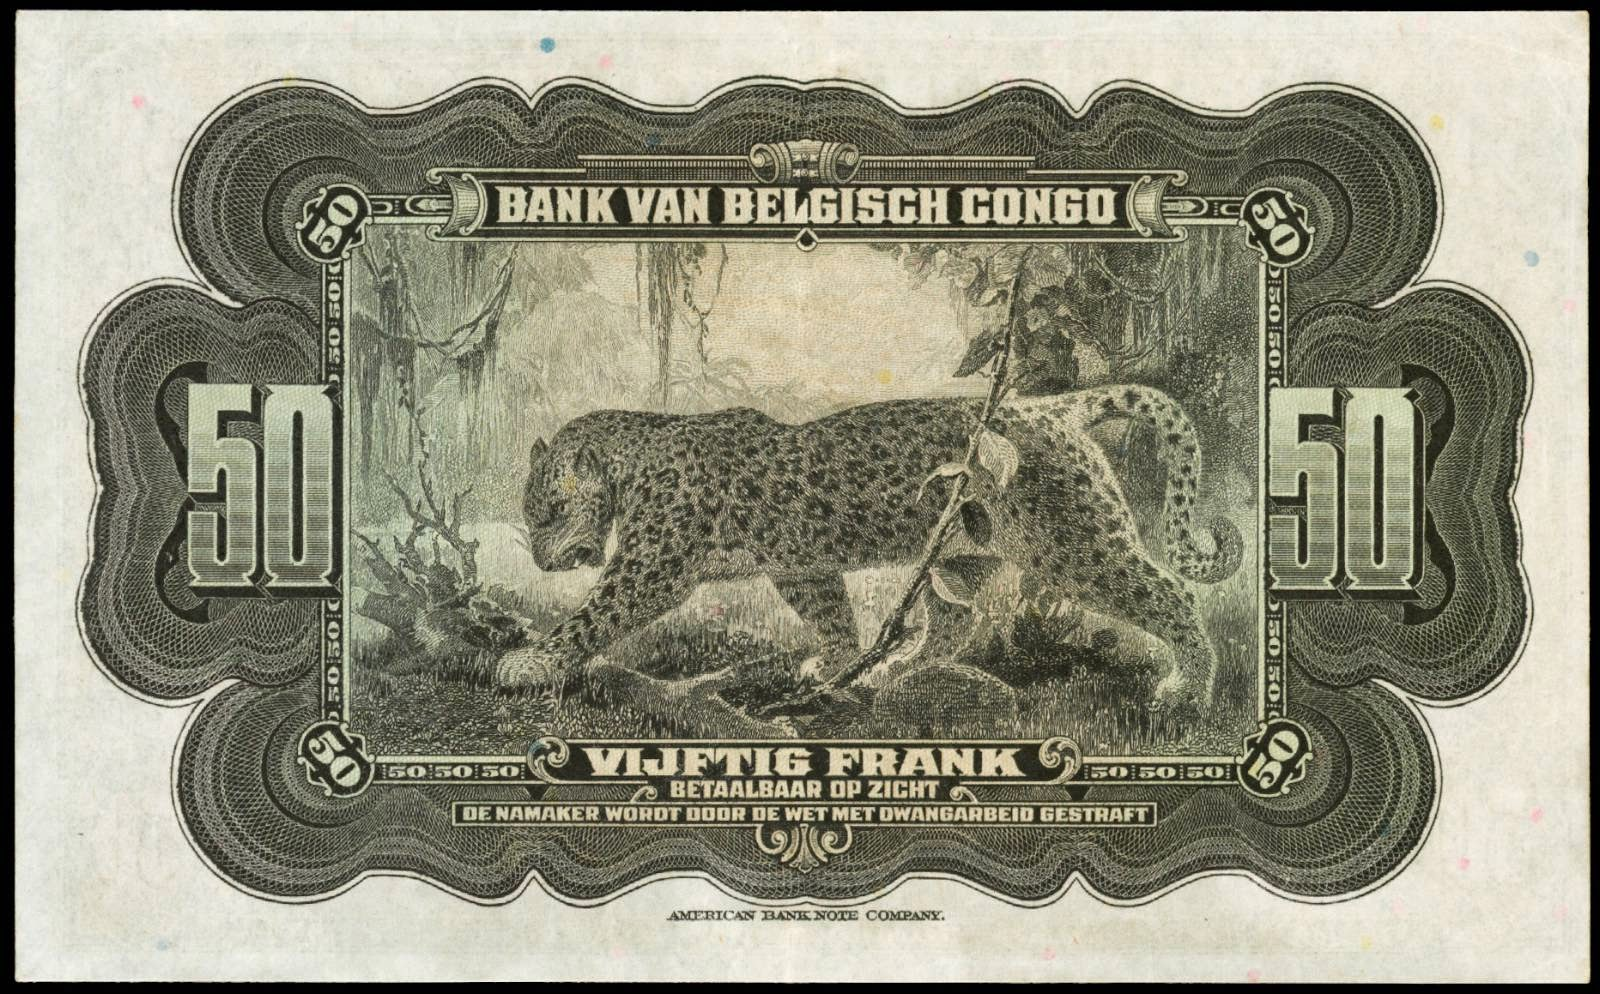 Belgian Congo 50 Francs banknote Leopard